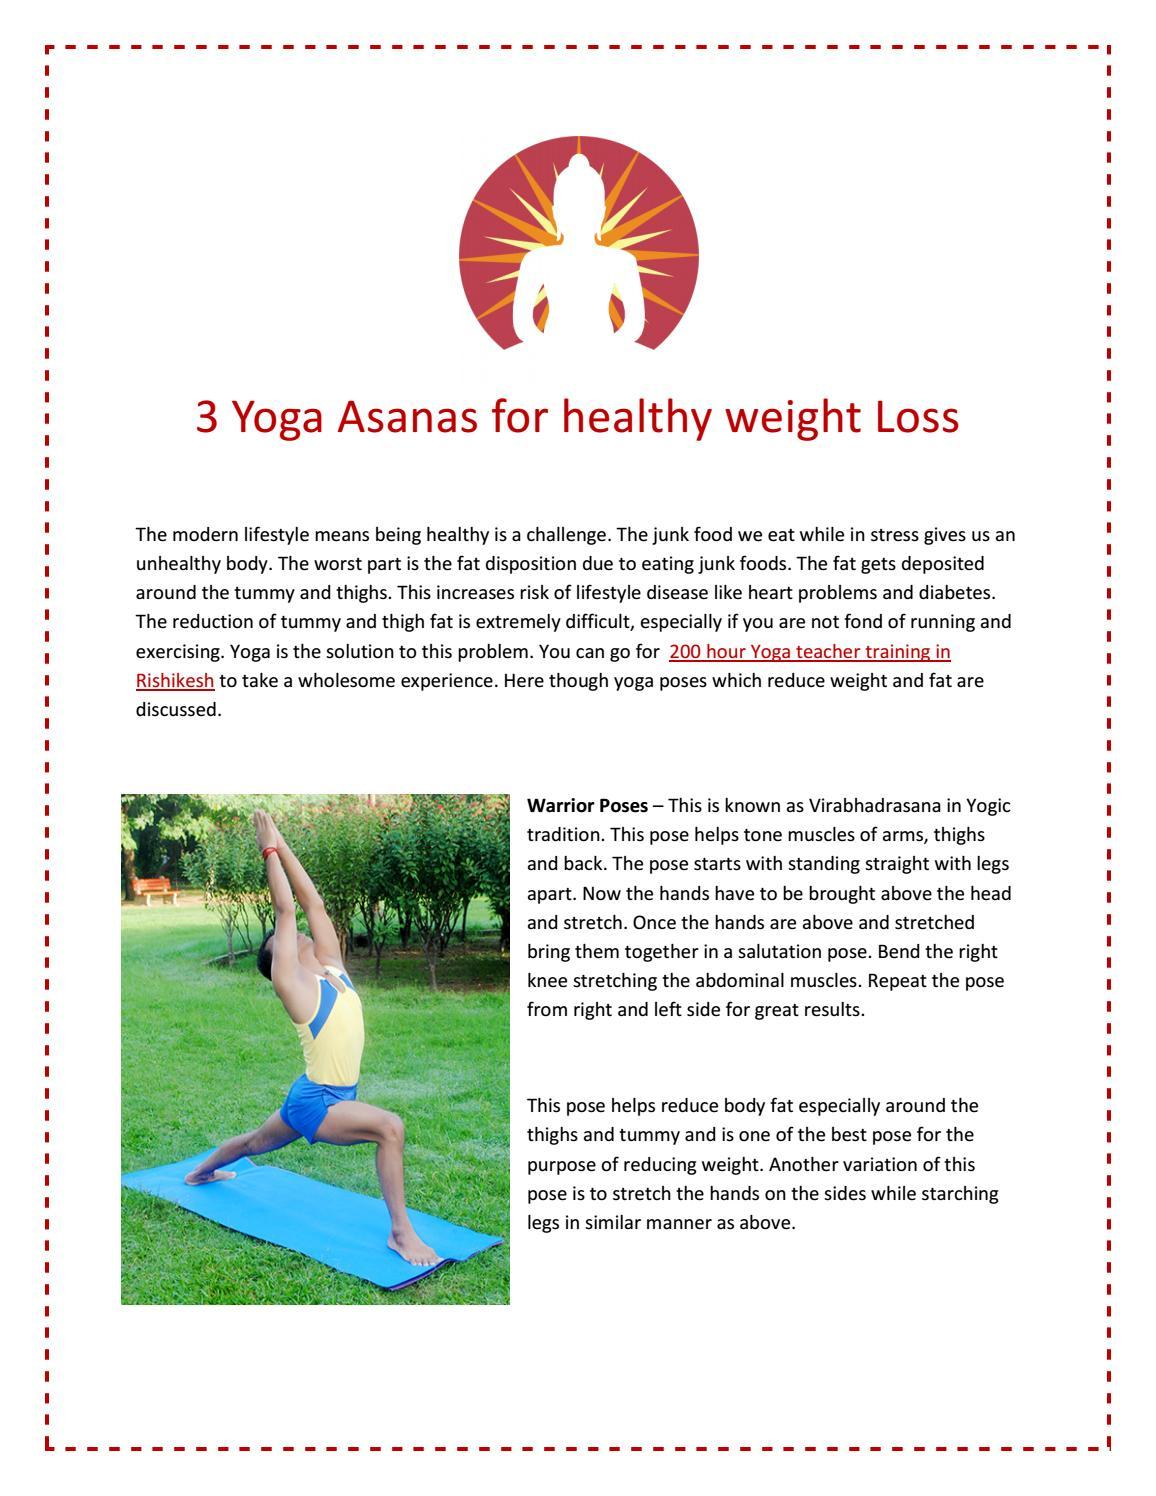 3 Yoga Asanas For Healthy Weight Loss By Ojashvi Yoga Shala Issuu